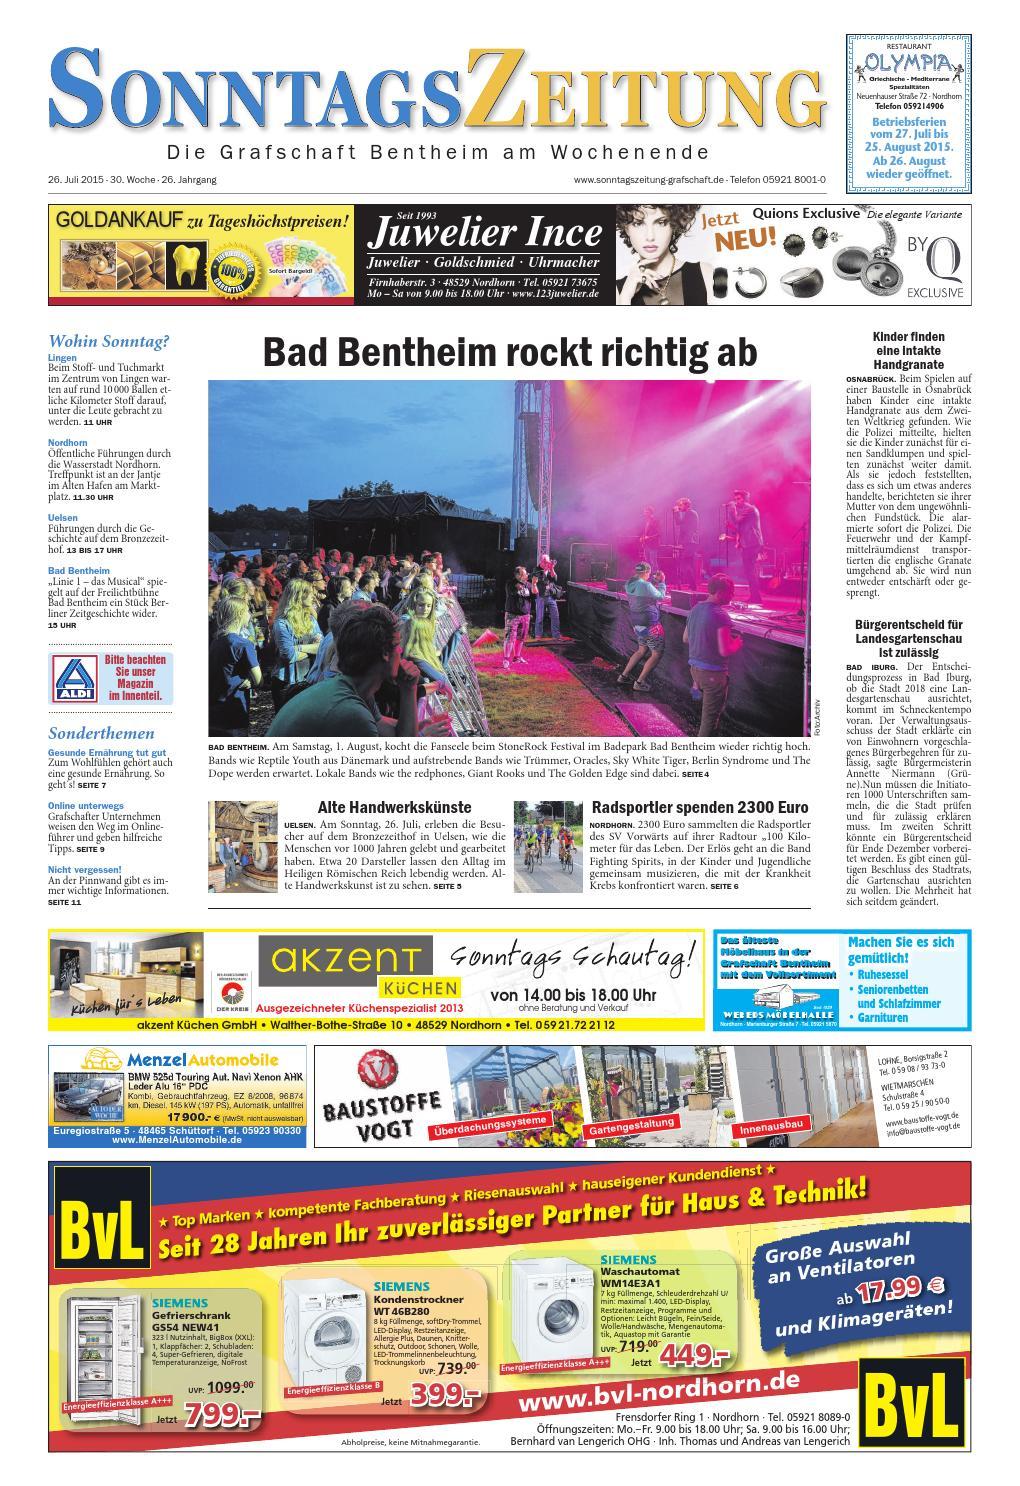 Sonntagszeitung_26.7.2015 by SonntagsZeitung - issuu